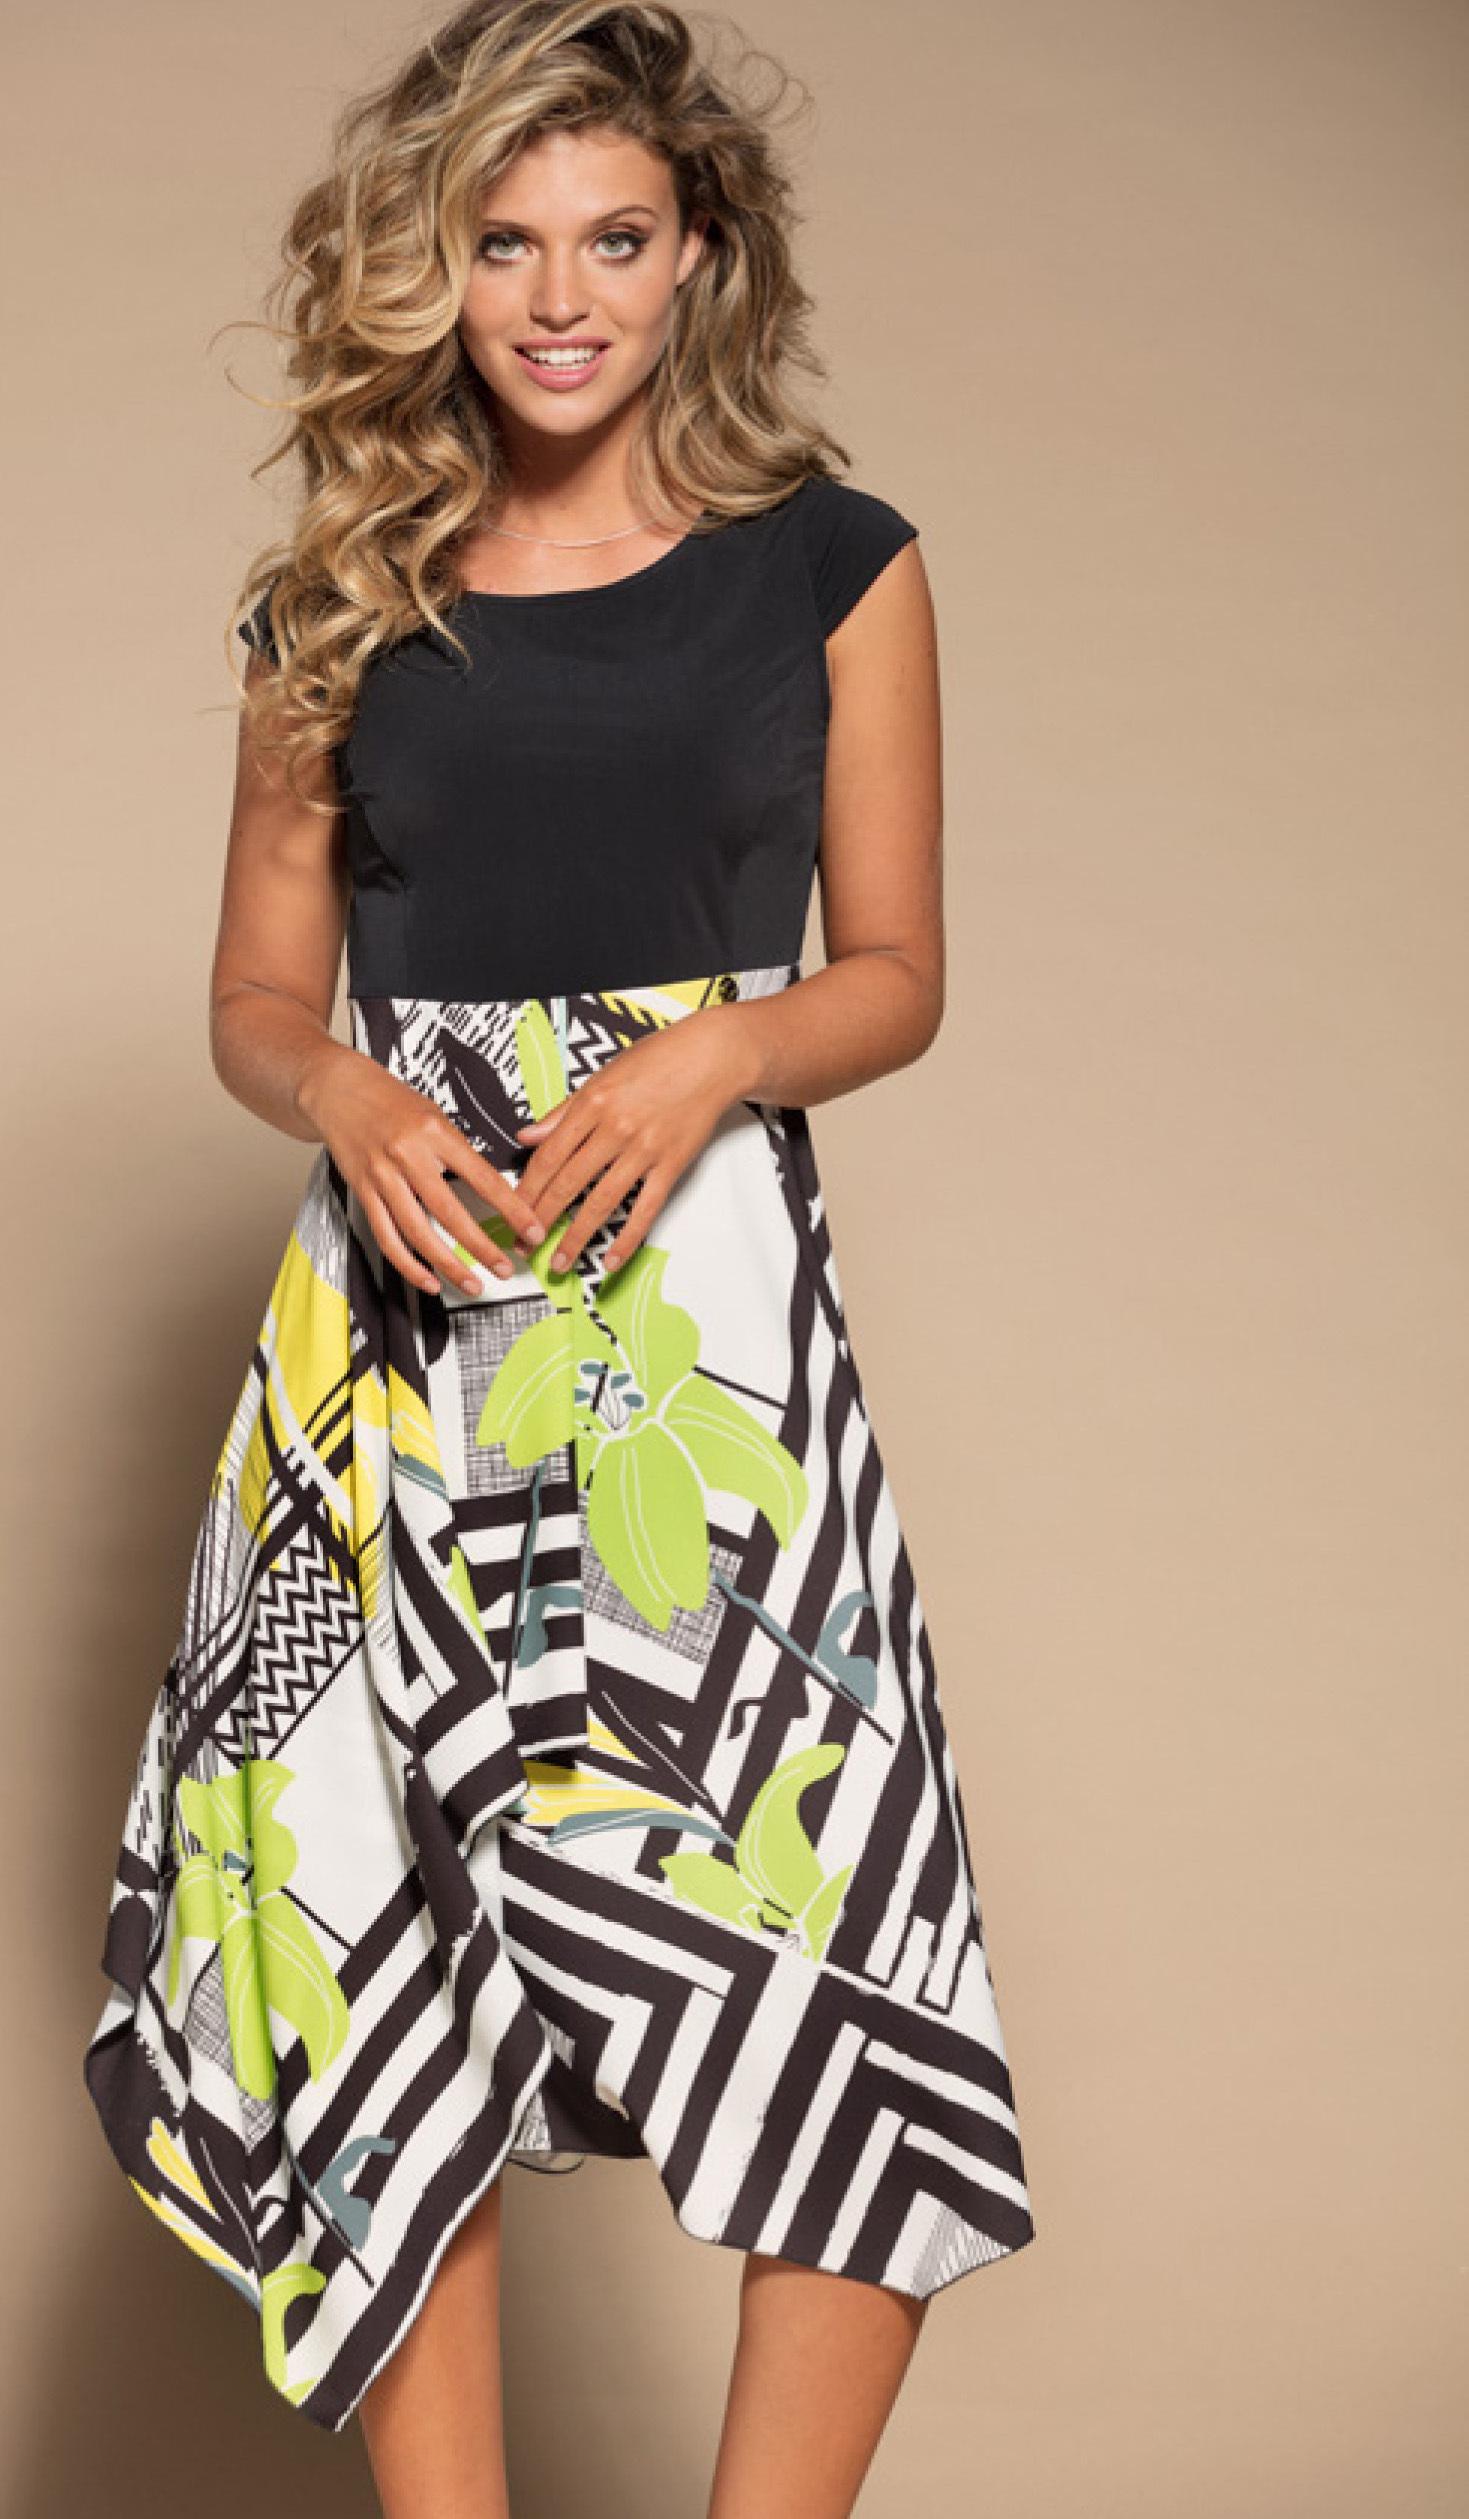 Maloka: Lemon Lime Marble High Waisted Asymmetrical Midi dress MK_NELY_N3